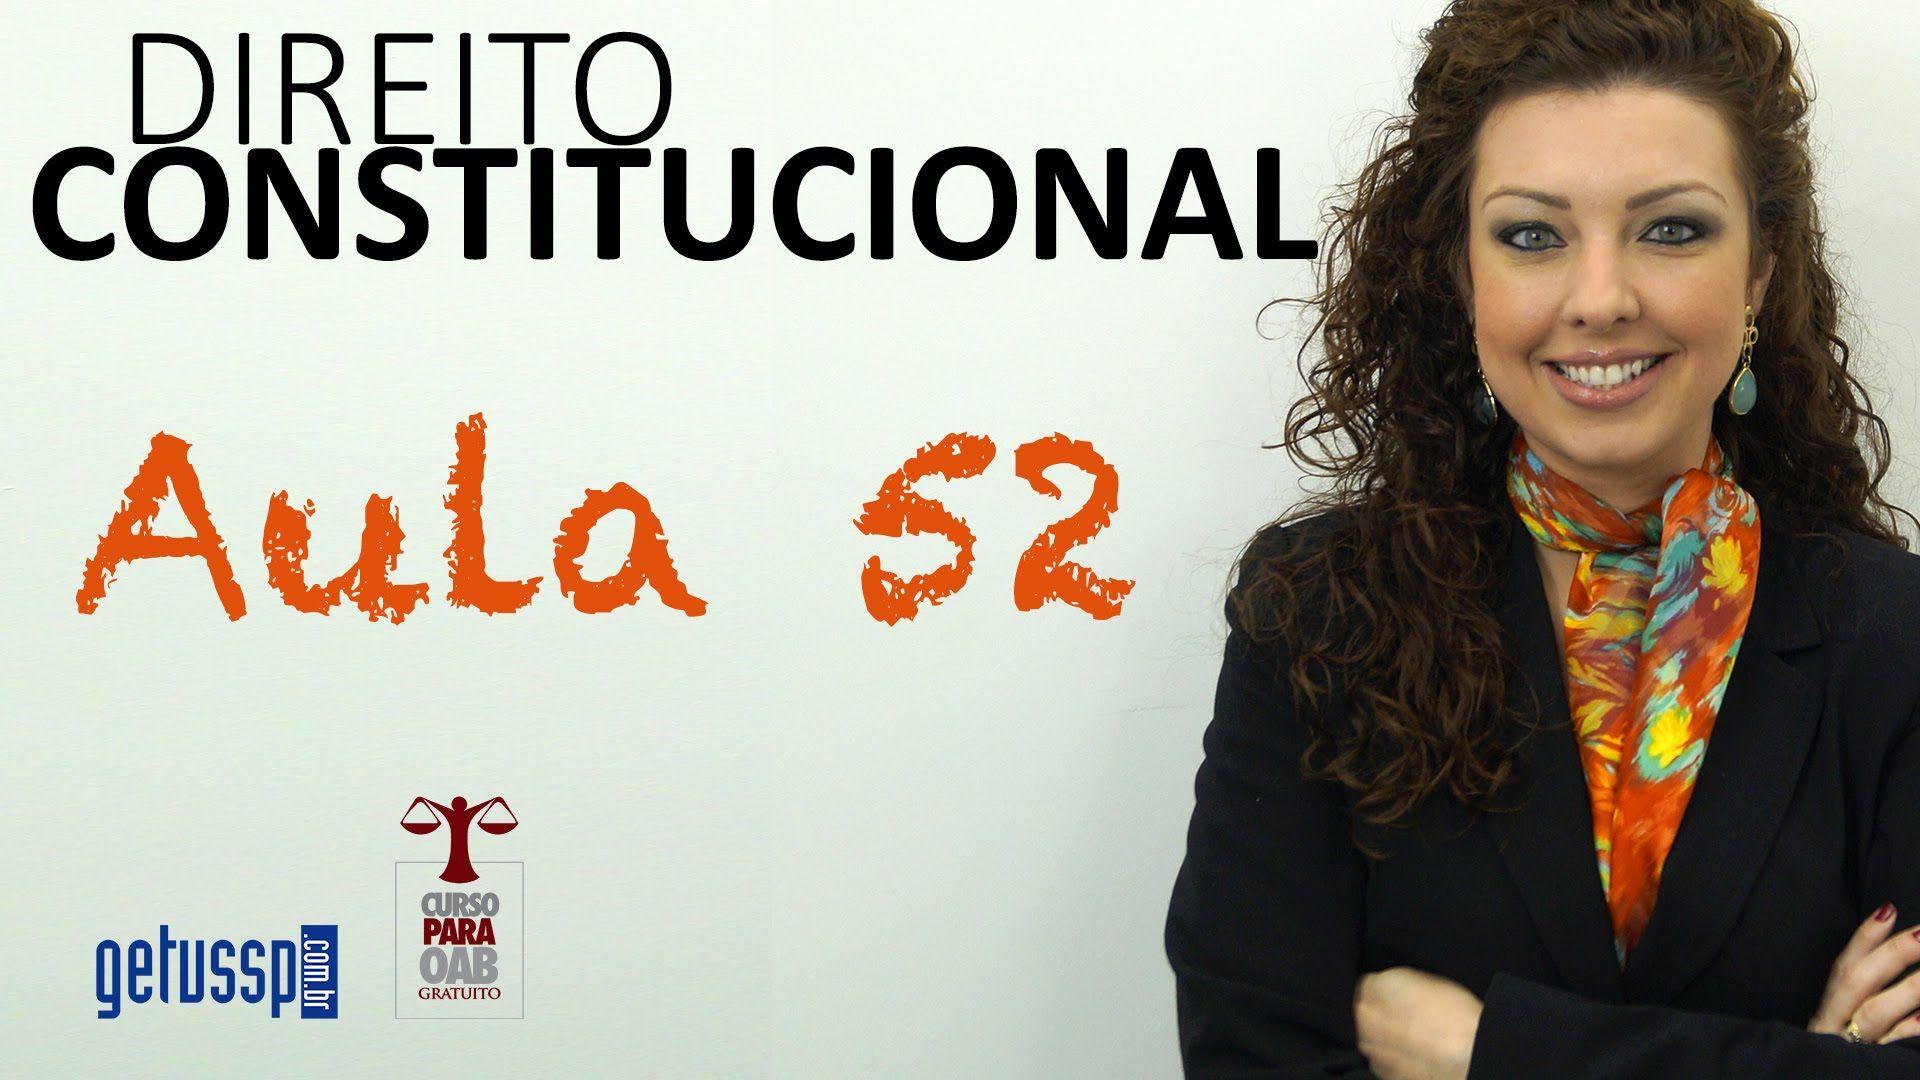 Aula 52 - Direito Constitucional - Processo Legislativo Constitucional